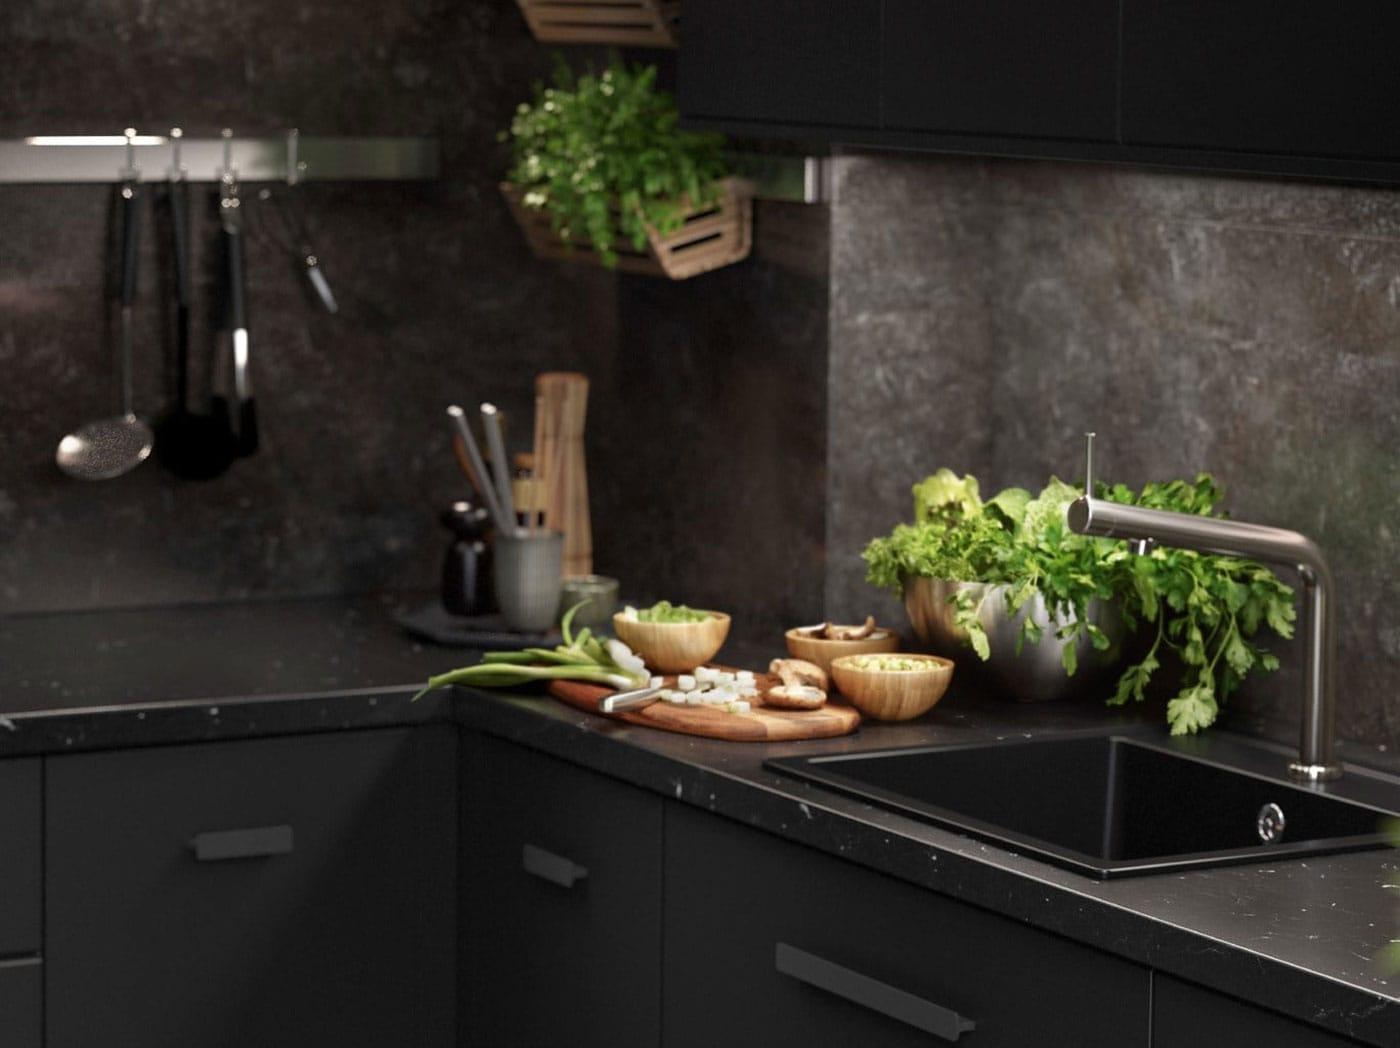 Čierna kuchyňa Kungsbacka so zeleninou a bylinkami.